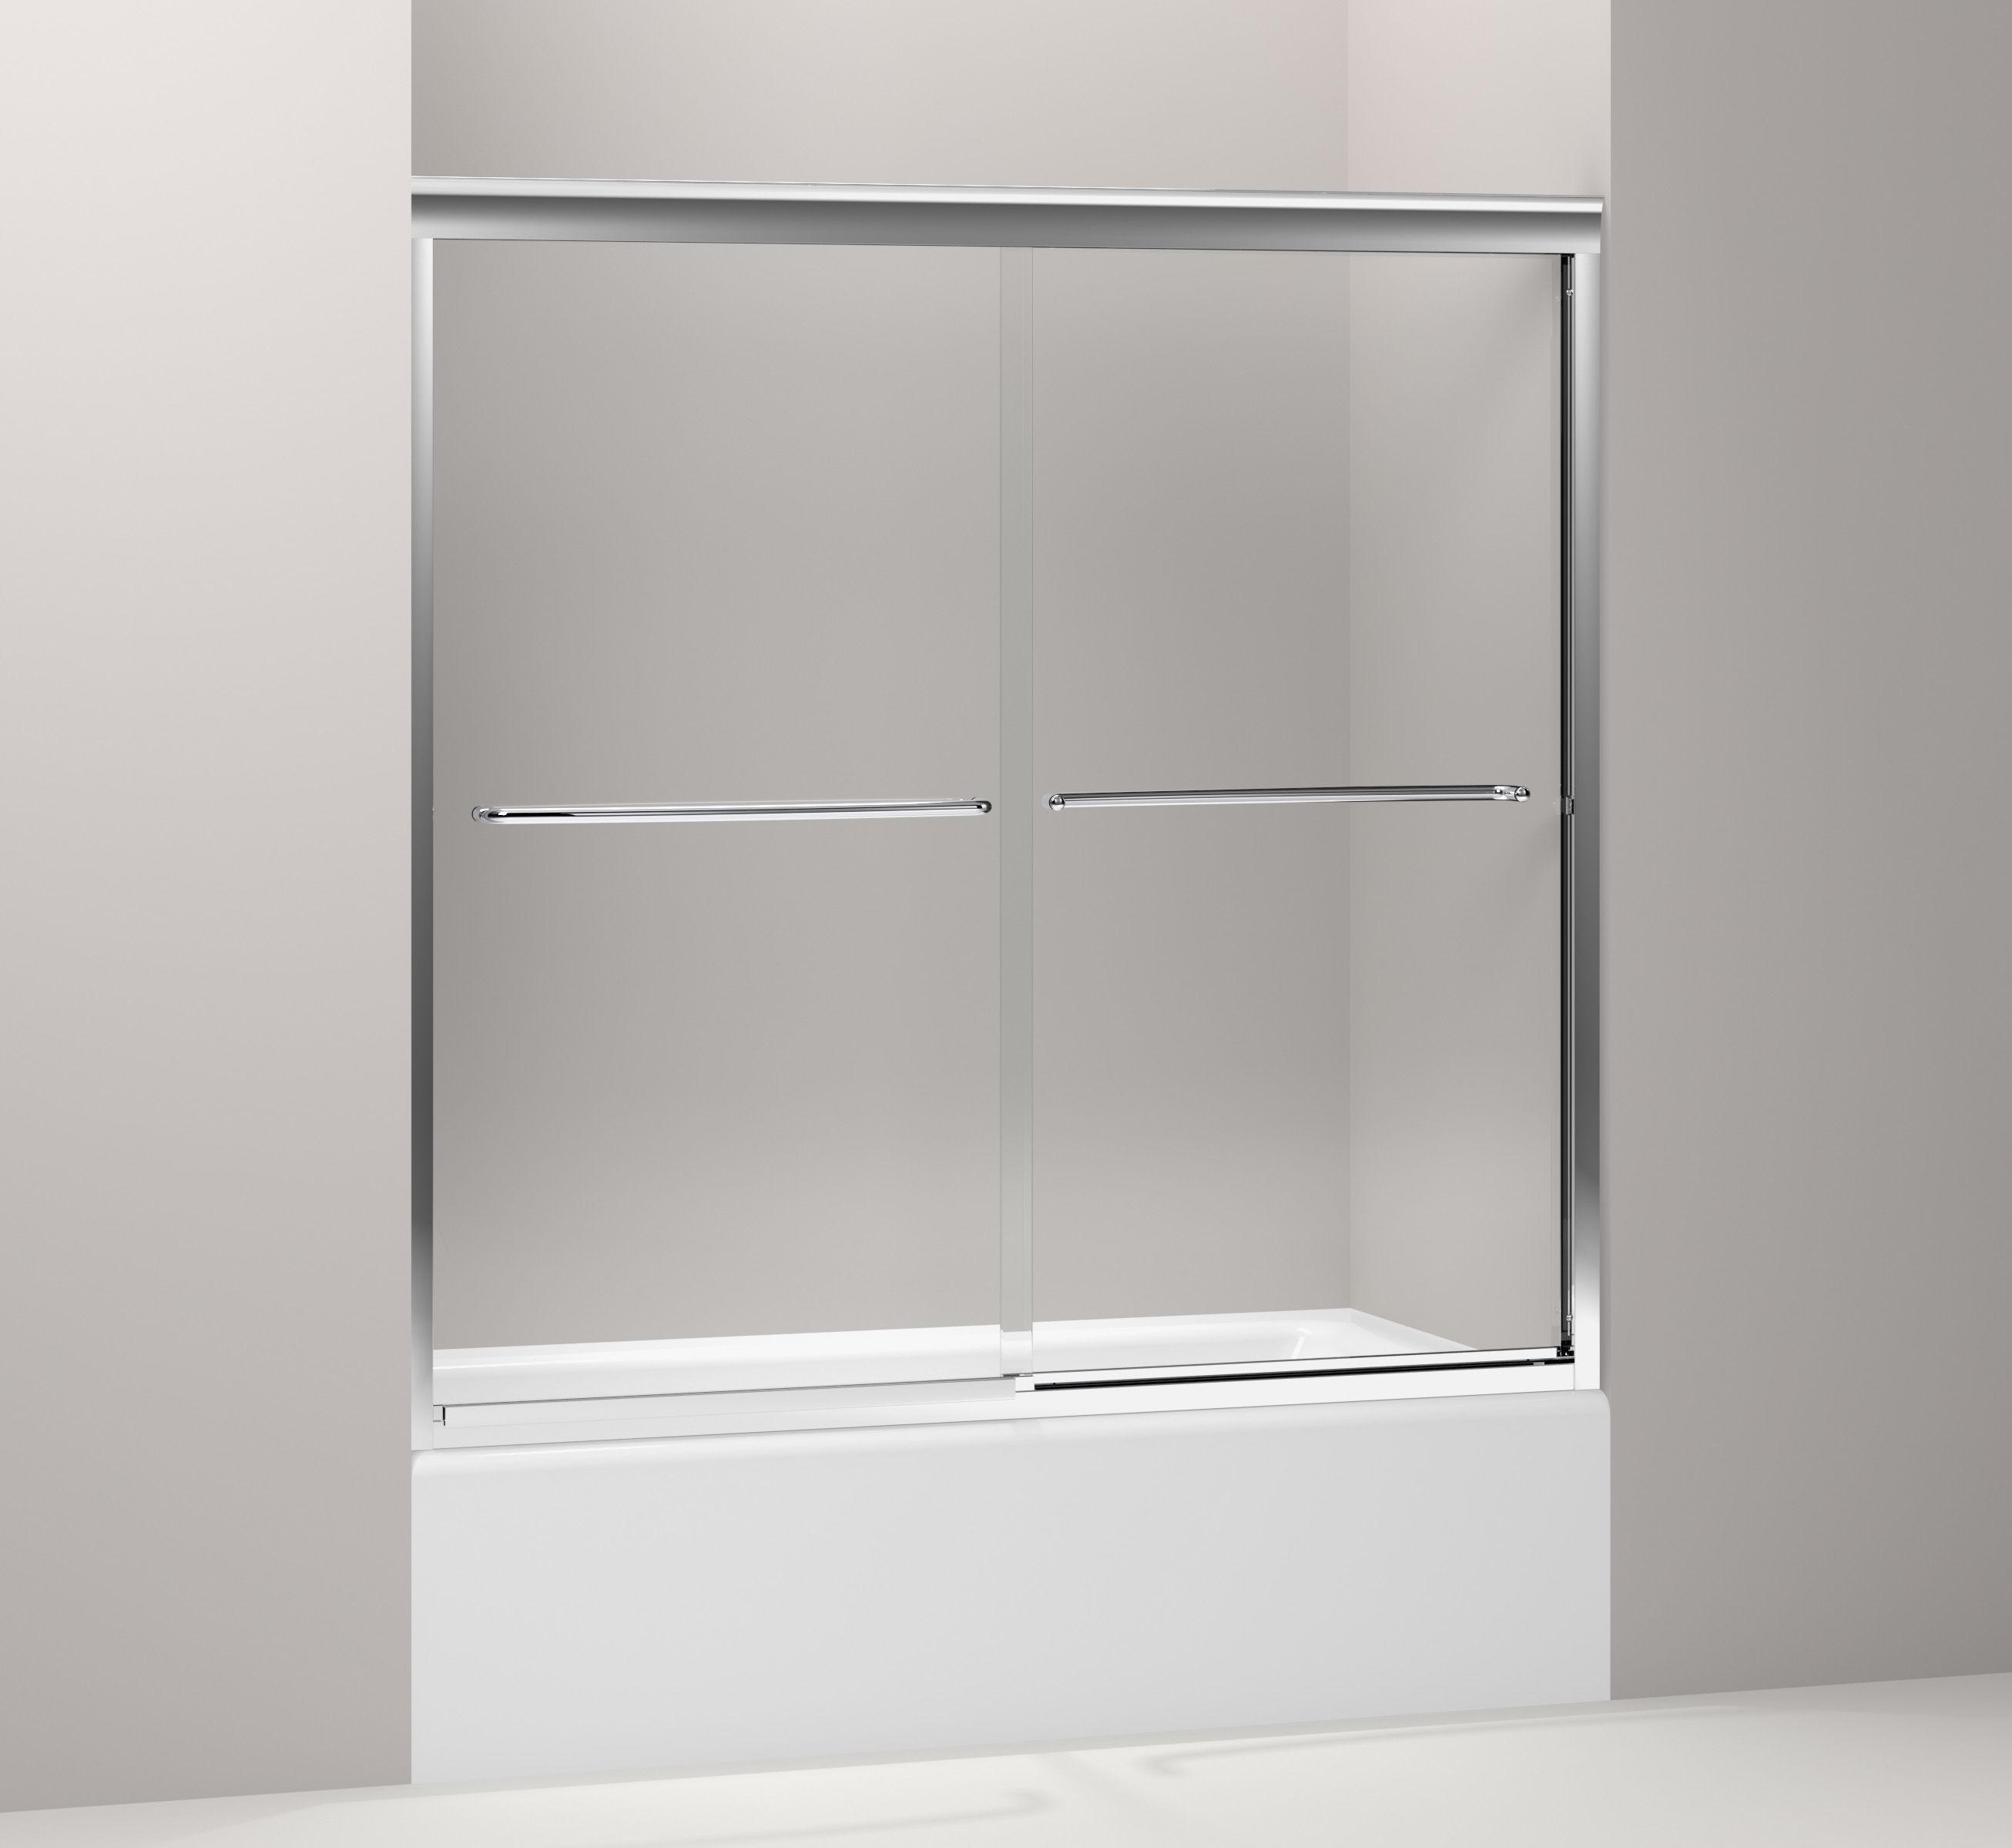 Kohler K 702200 L Mx Matte Nickel Fluence Frameless Byp Bath Door With Crystal Clear Gl 58 5 16 H X 59 8 W Faucet